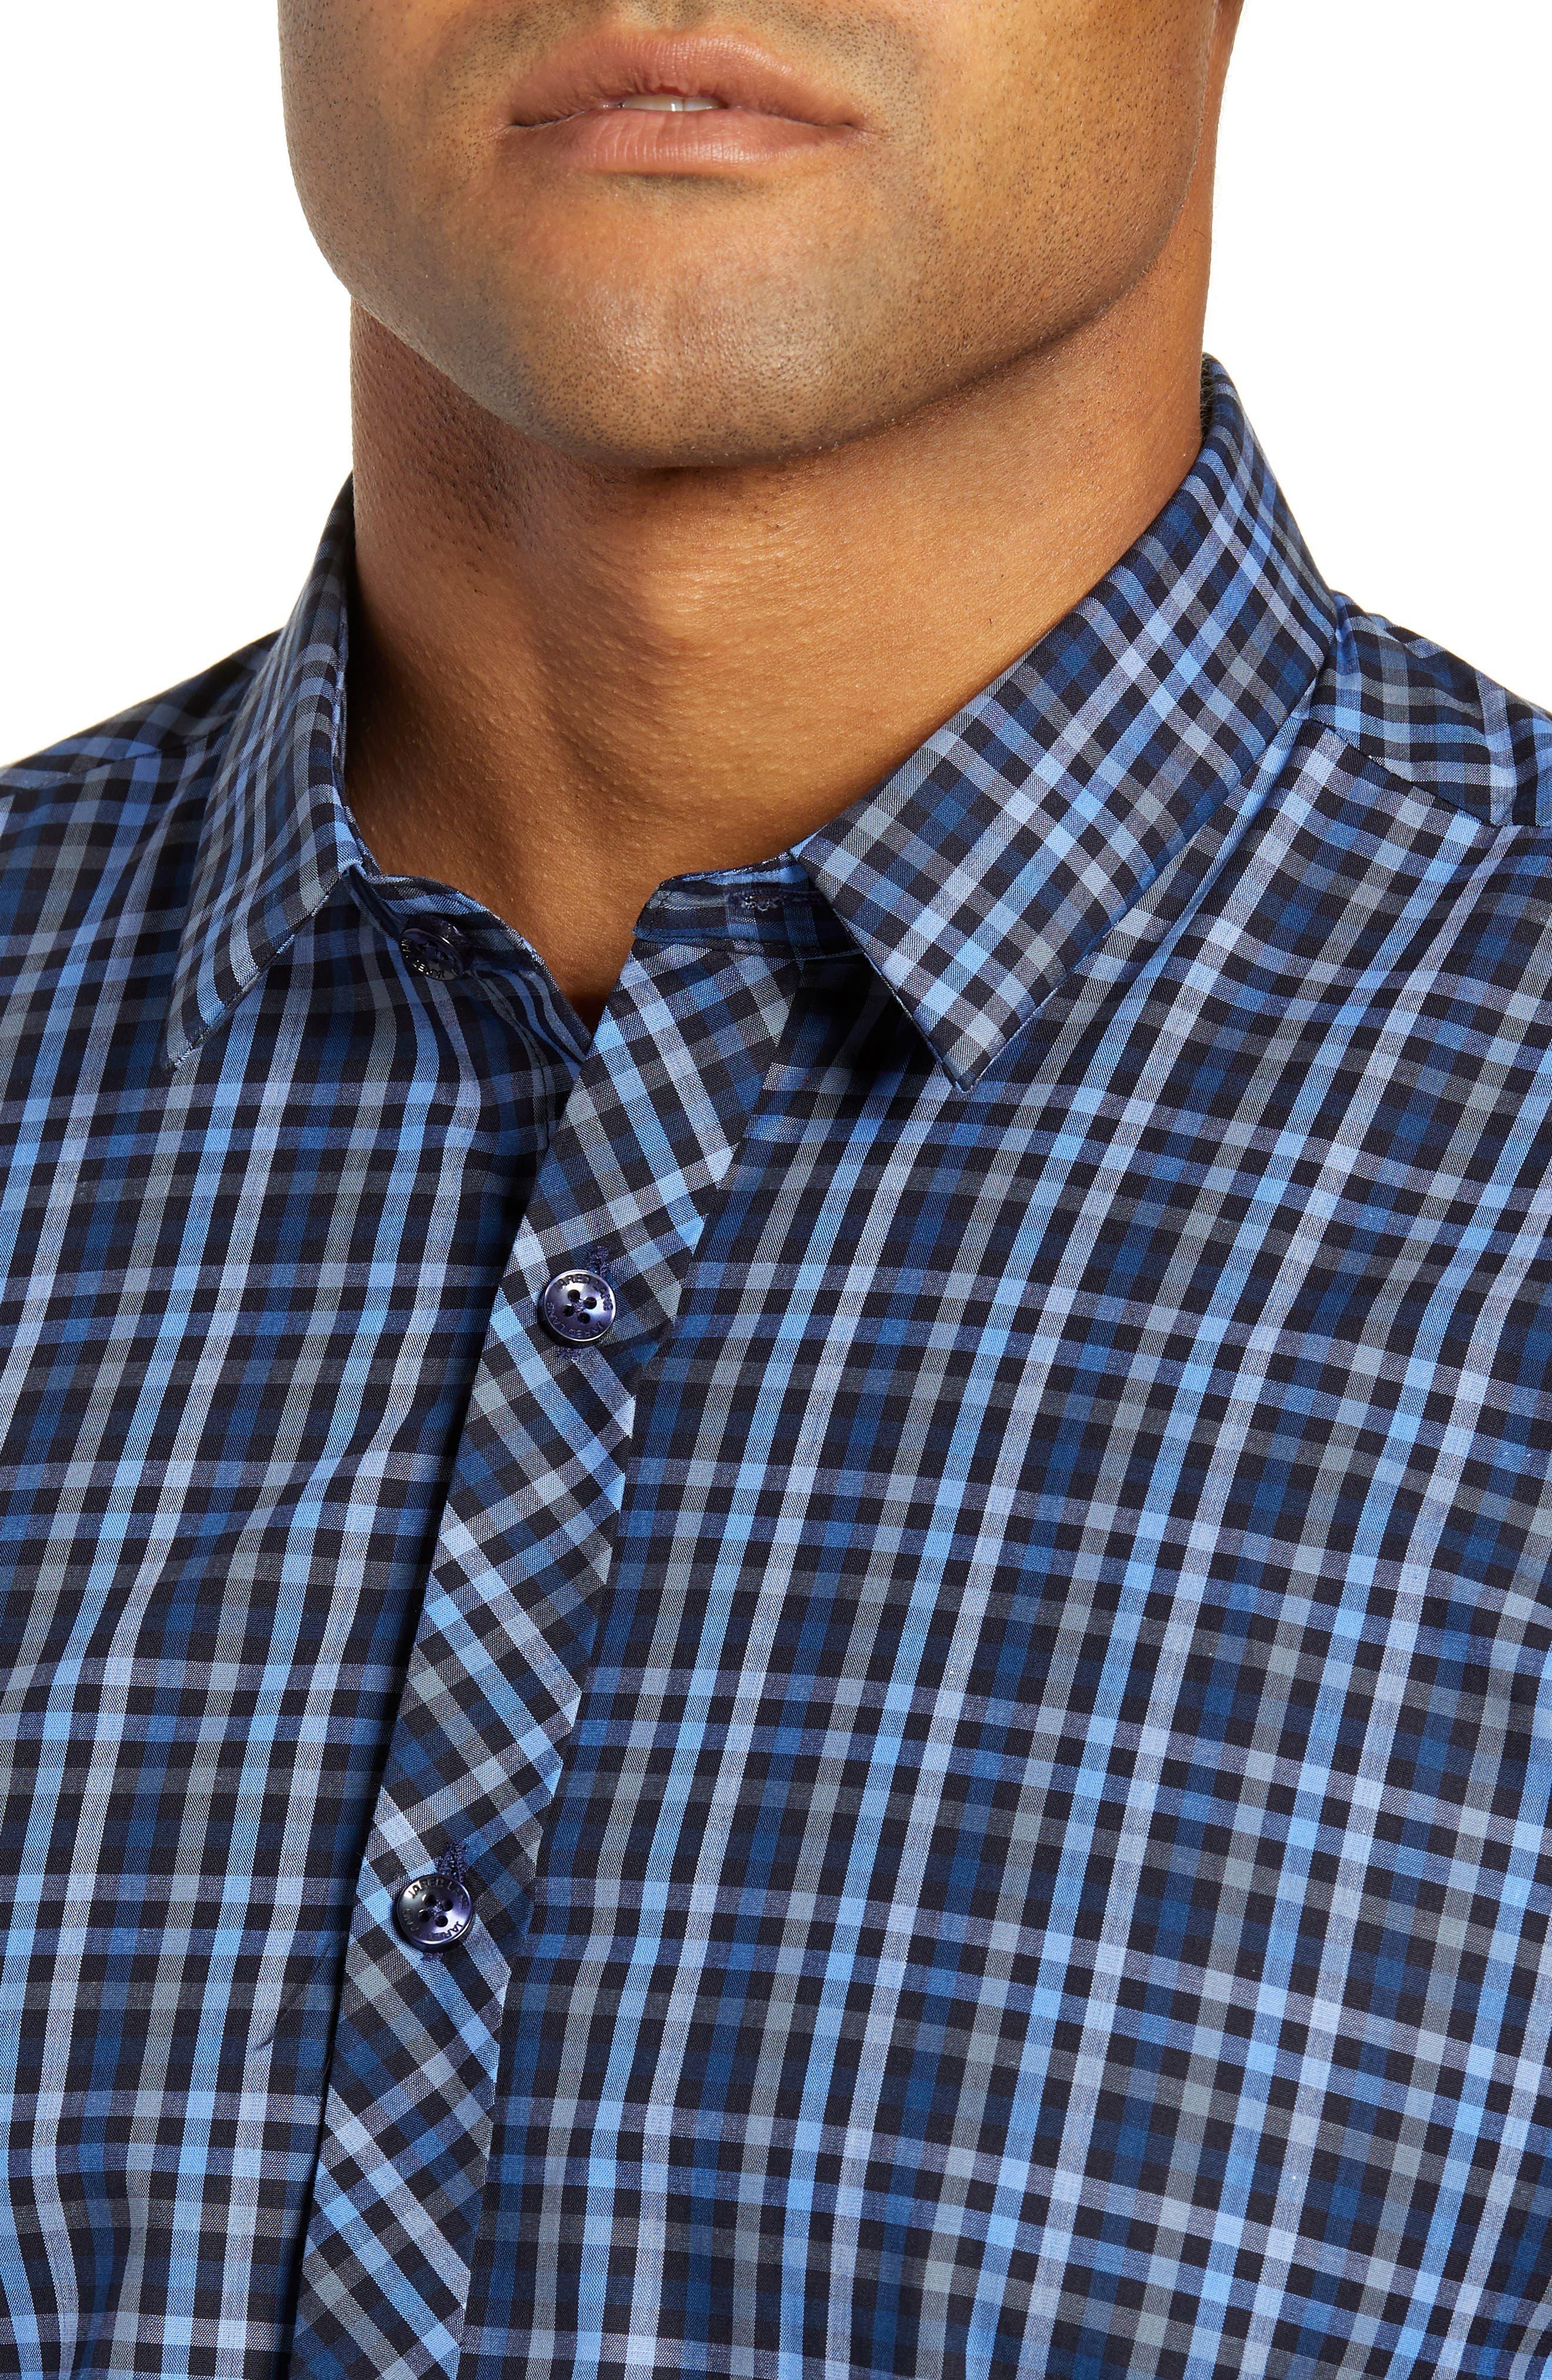 Trim Fit Sport Shirt,                             Alternate thumbnail 2, color,                             NAVY - BLUE MULTI CHECK